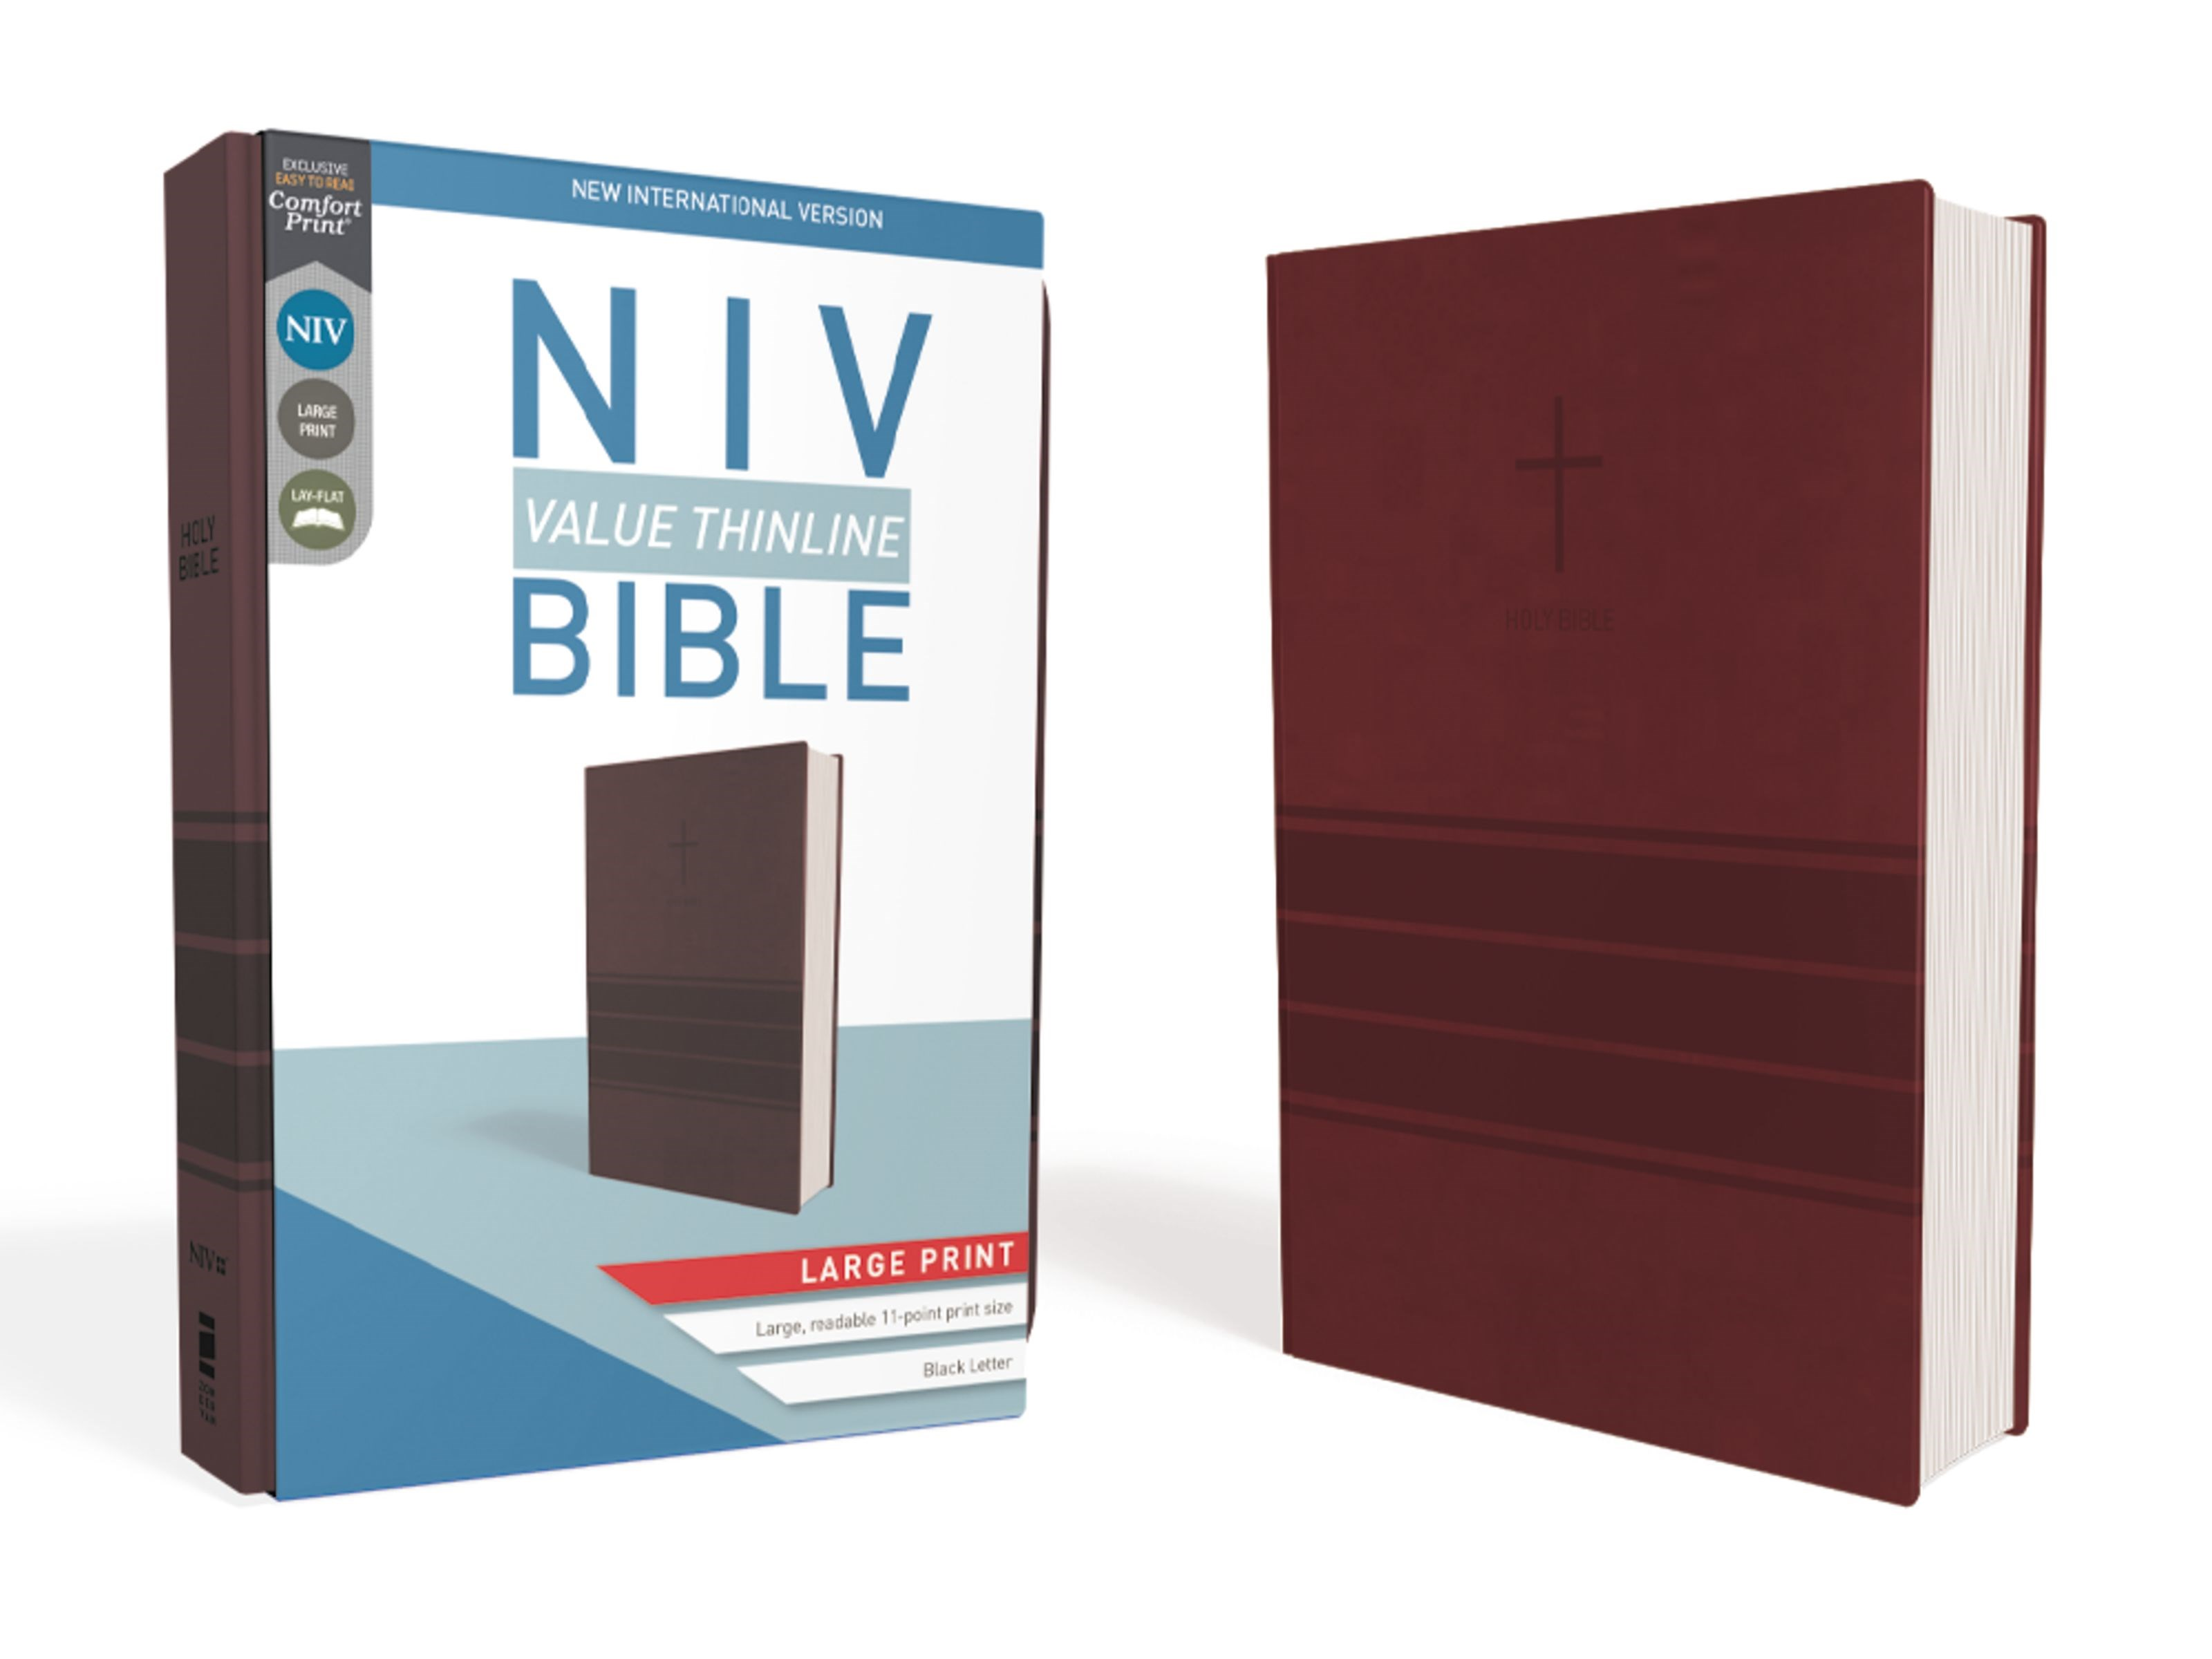 NIV Value Thinline Bible/Large Print (Comfort Print)-Burgundy Leathersoft